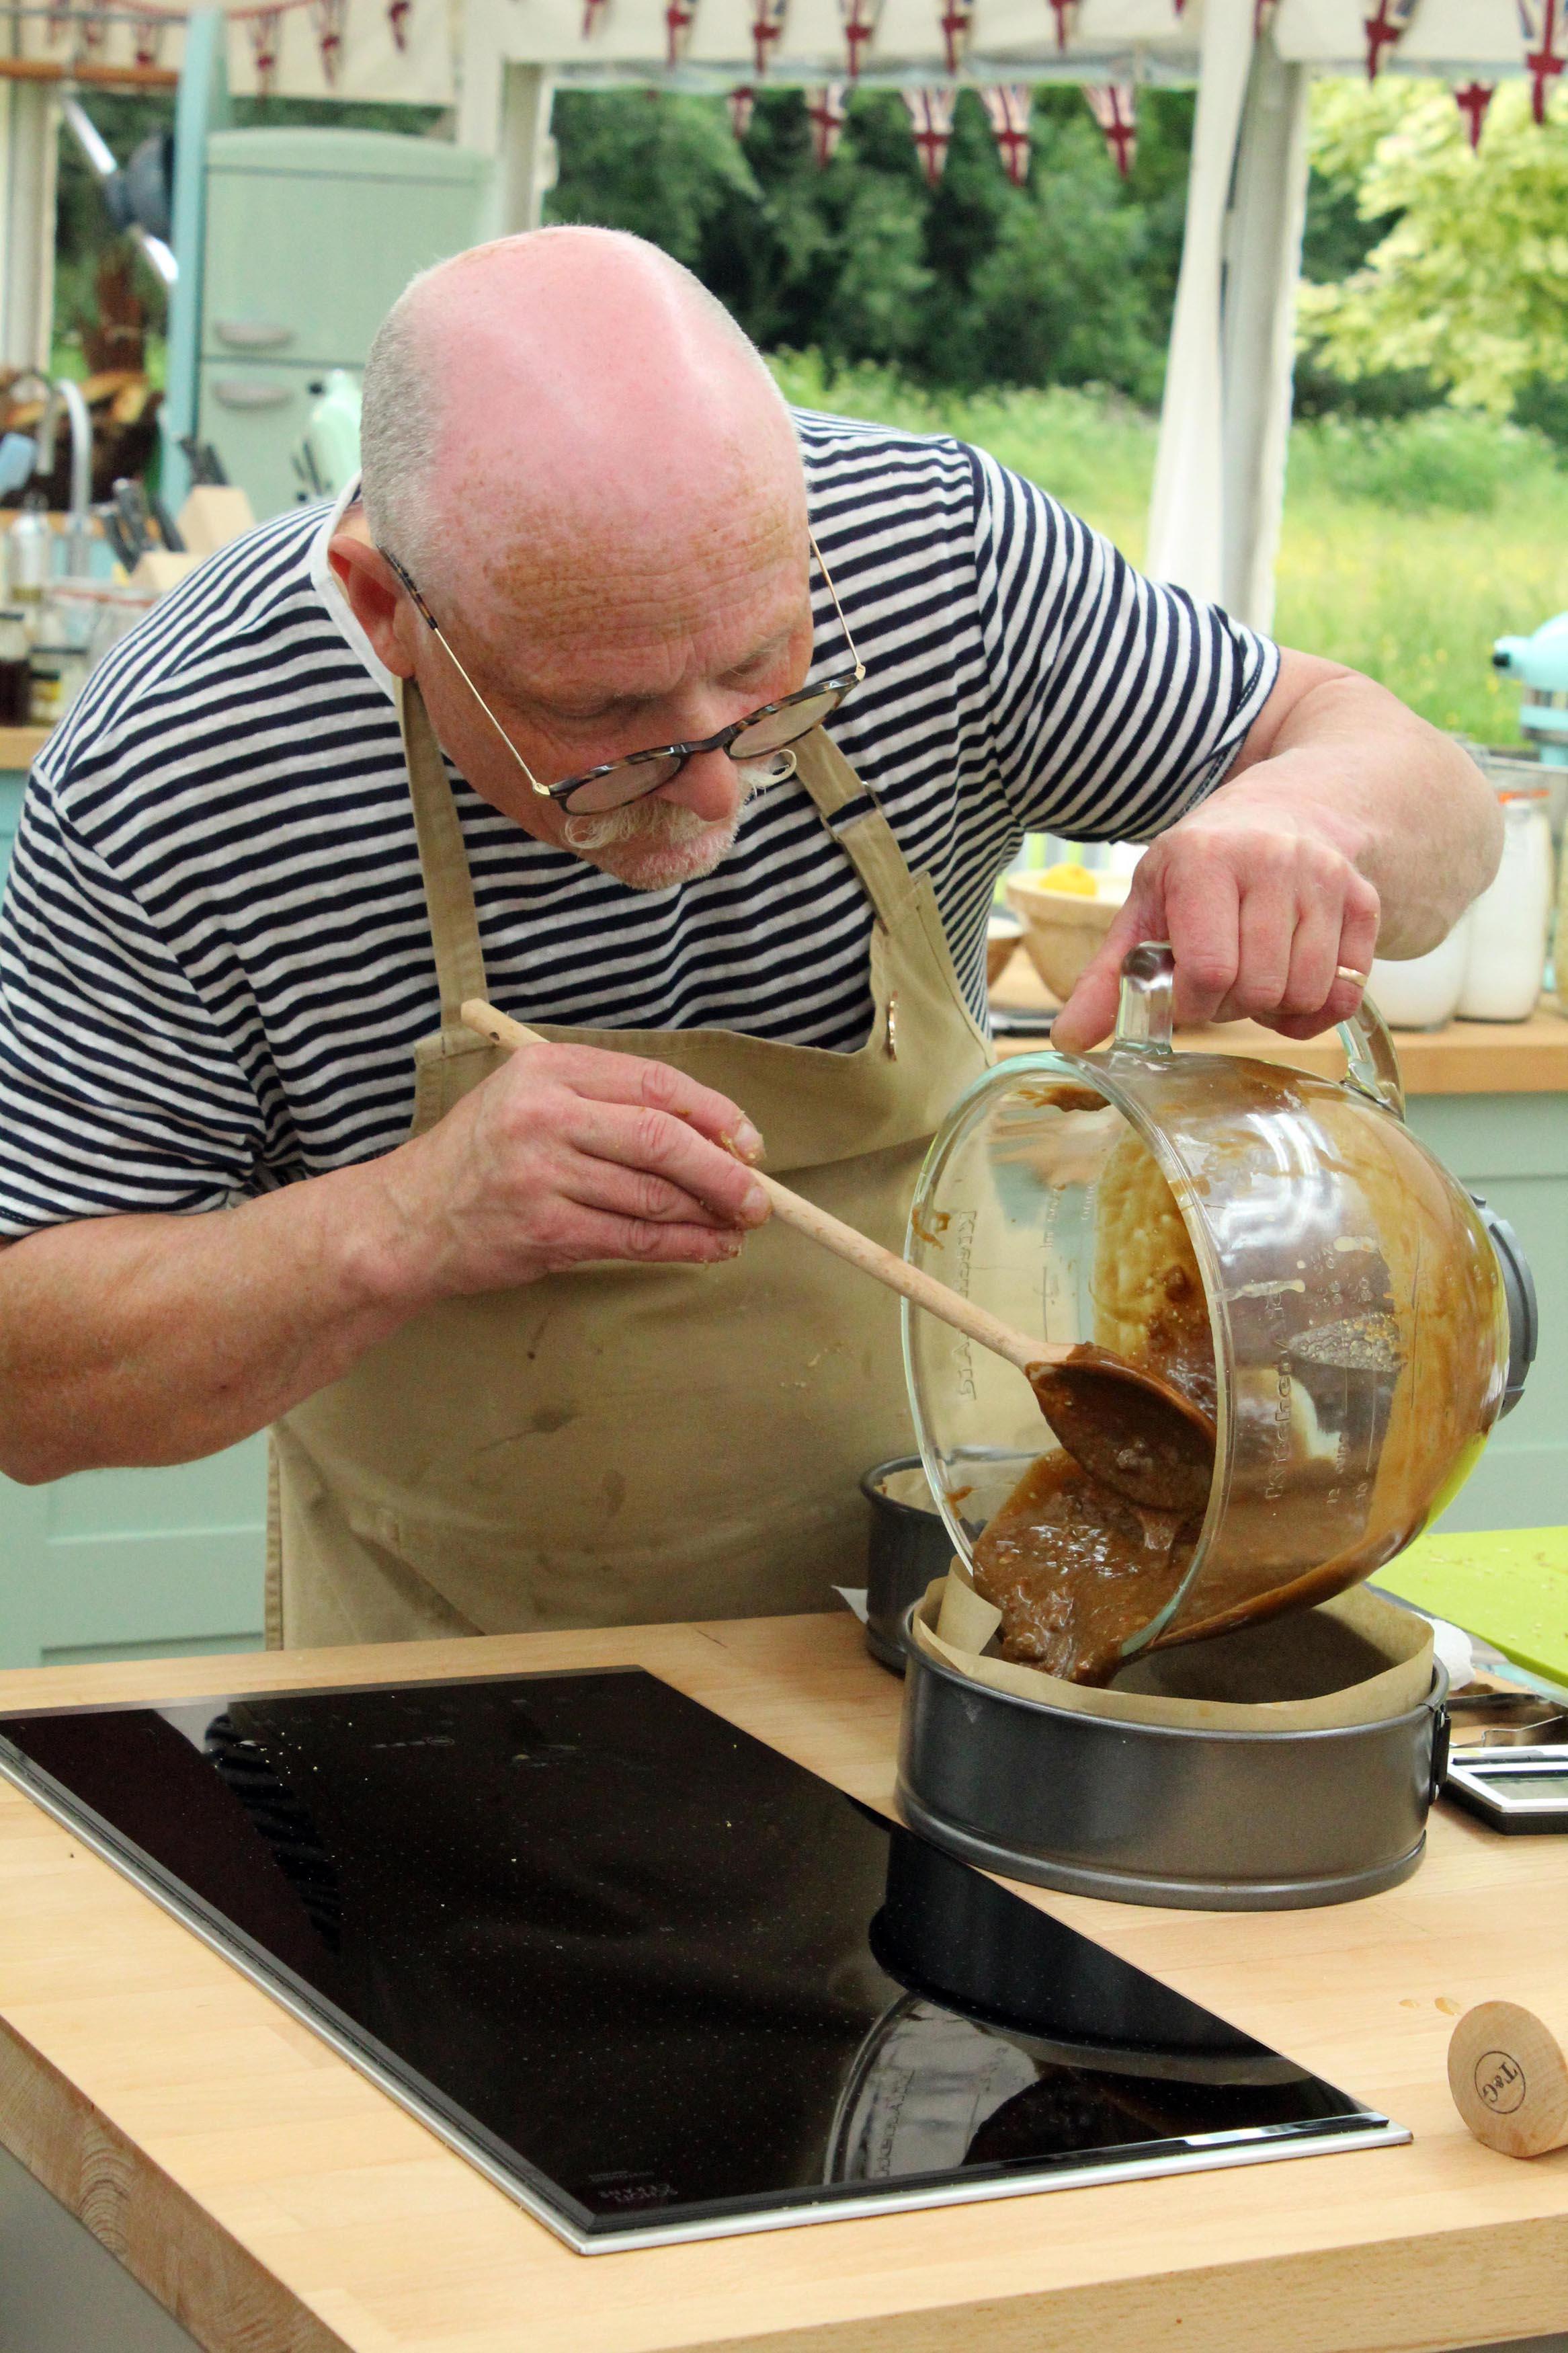 Episode 5, Signature Bake; Terry baking